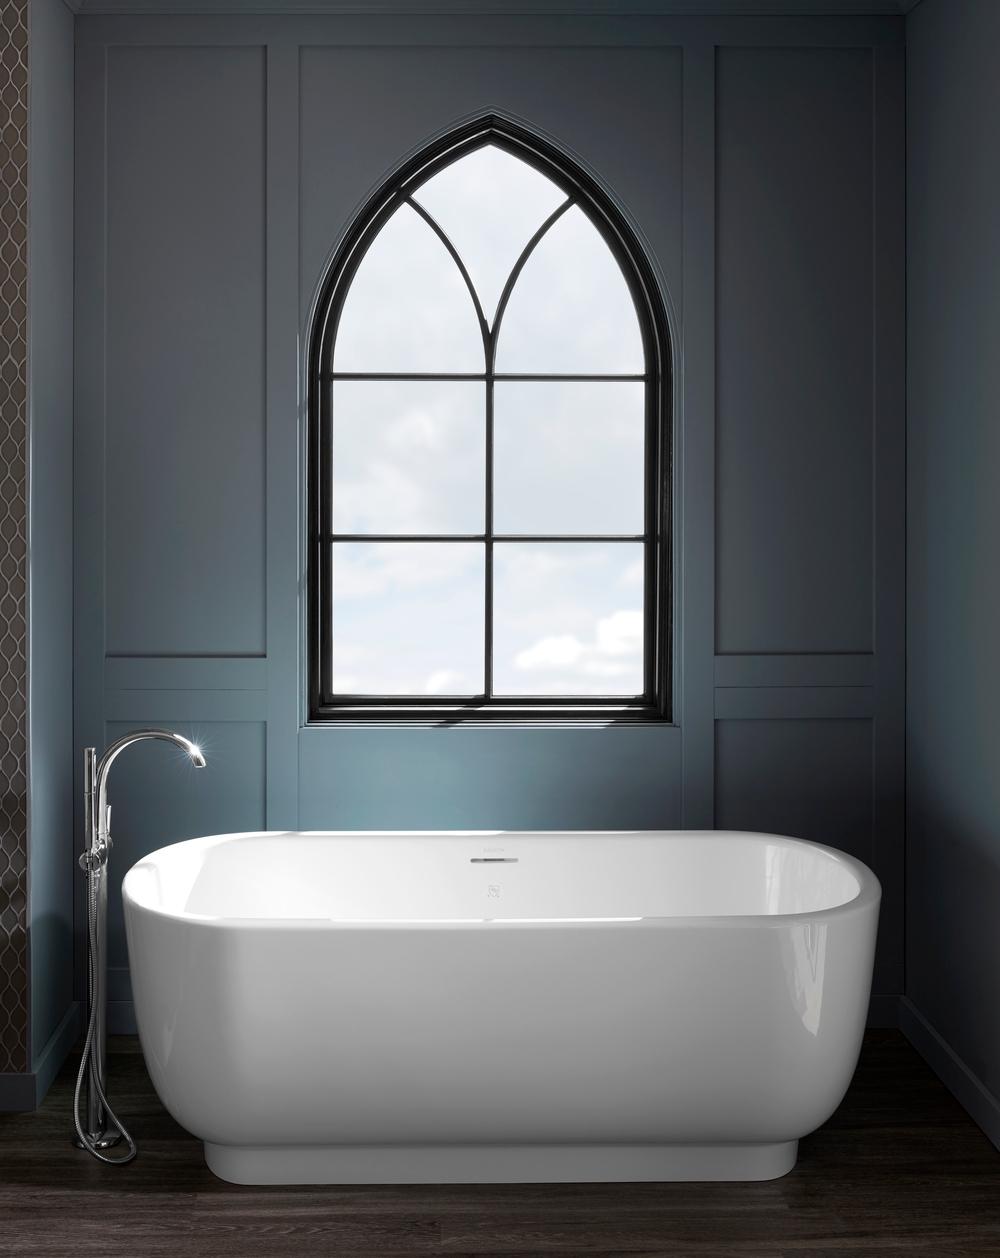 dark gray bathroom walls, white freestanding tub, and black custom shape window overhead